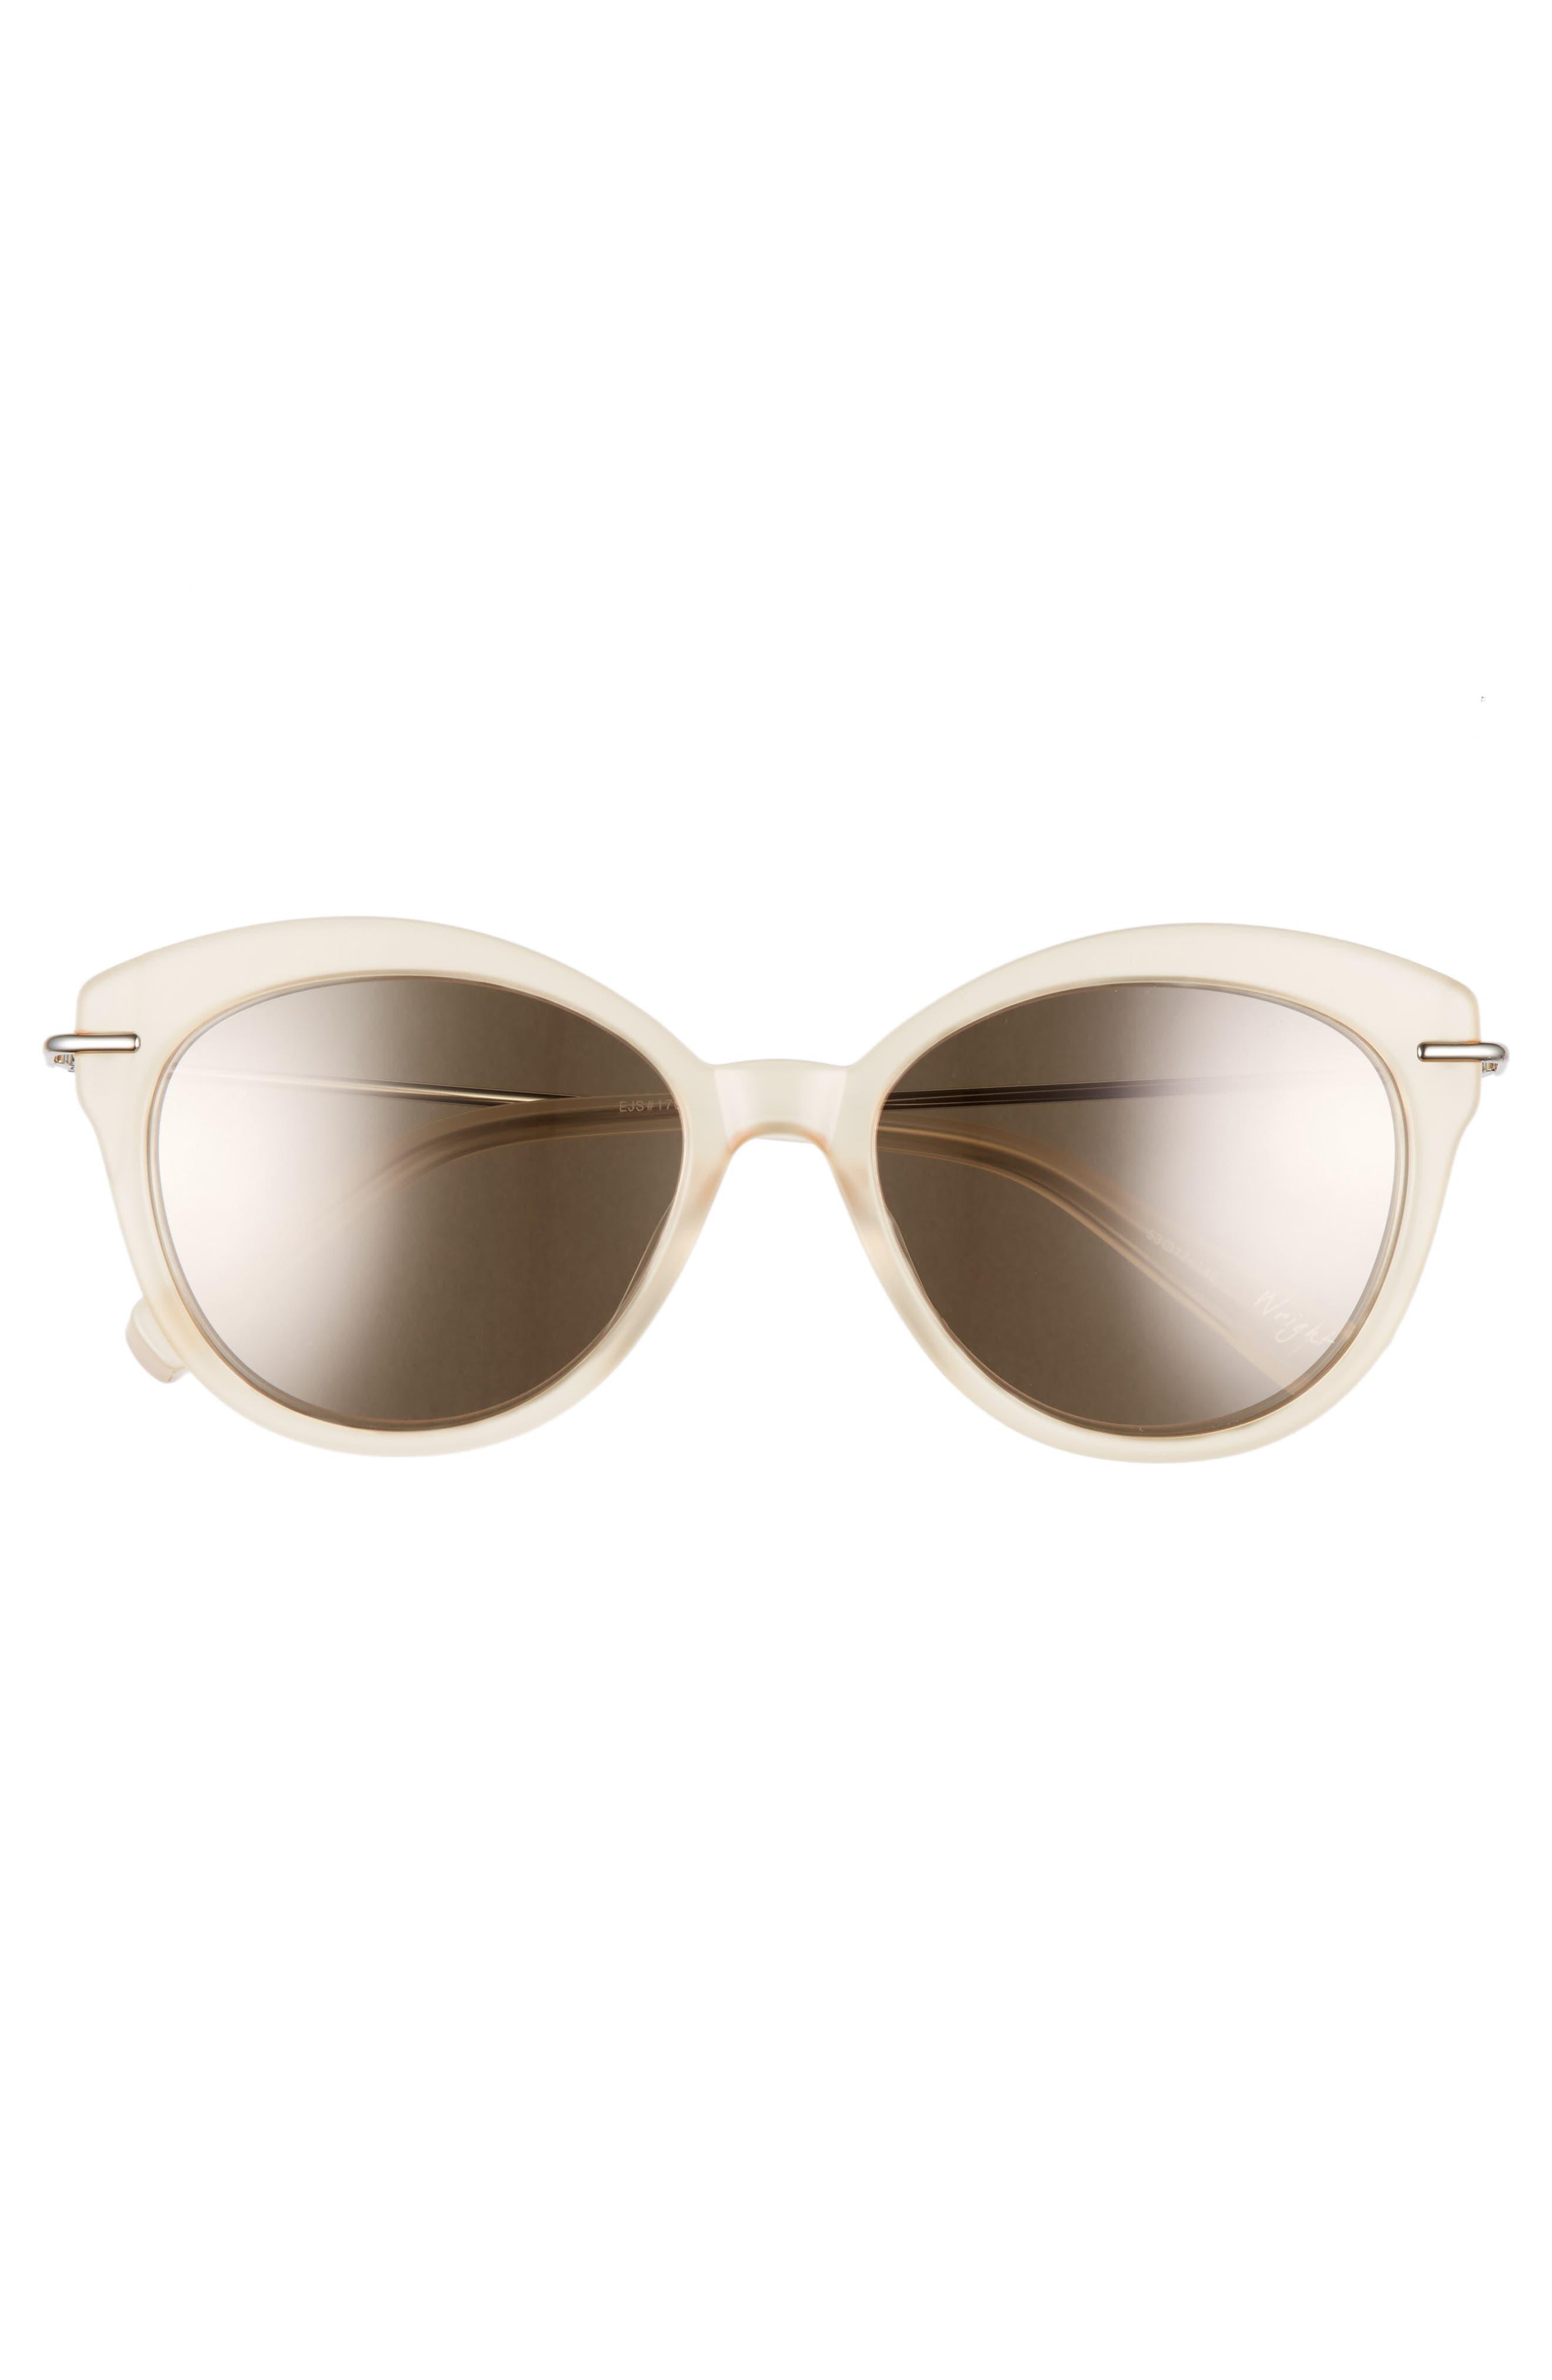 ELIZABETH AND JAMES,                             Wright 53mm Cat Eye Sunglasses,                             Alternate thumbnail 3, color,                             001